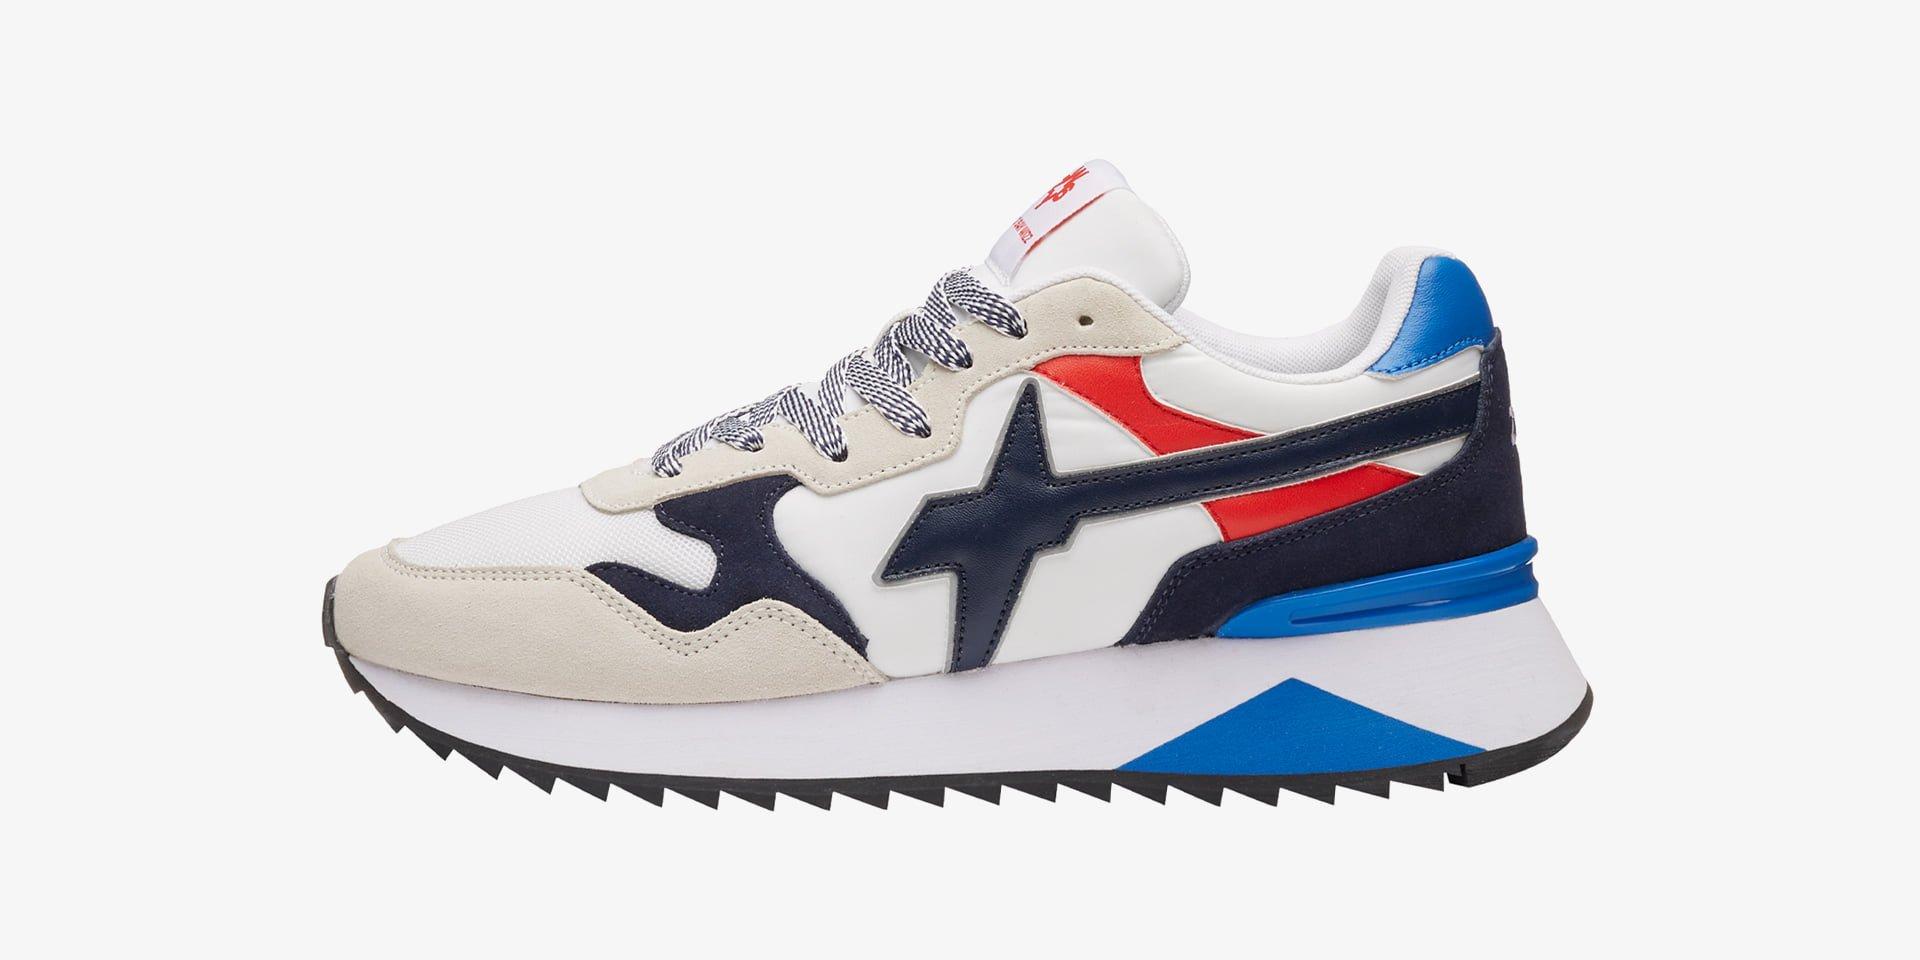 YAK-M. - Sneaker in tessuto e pelle - Bianco-Blu